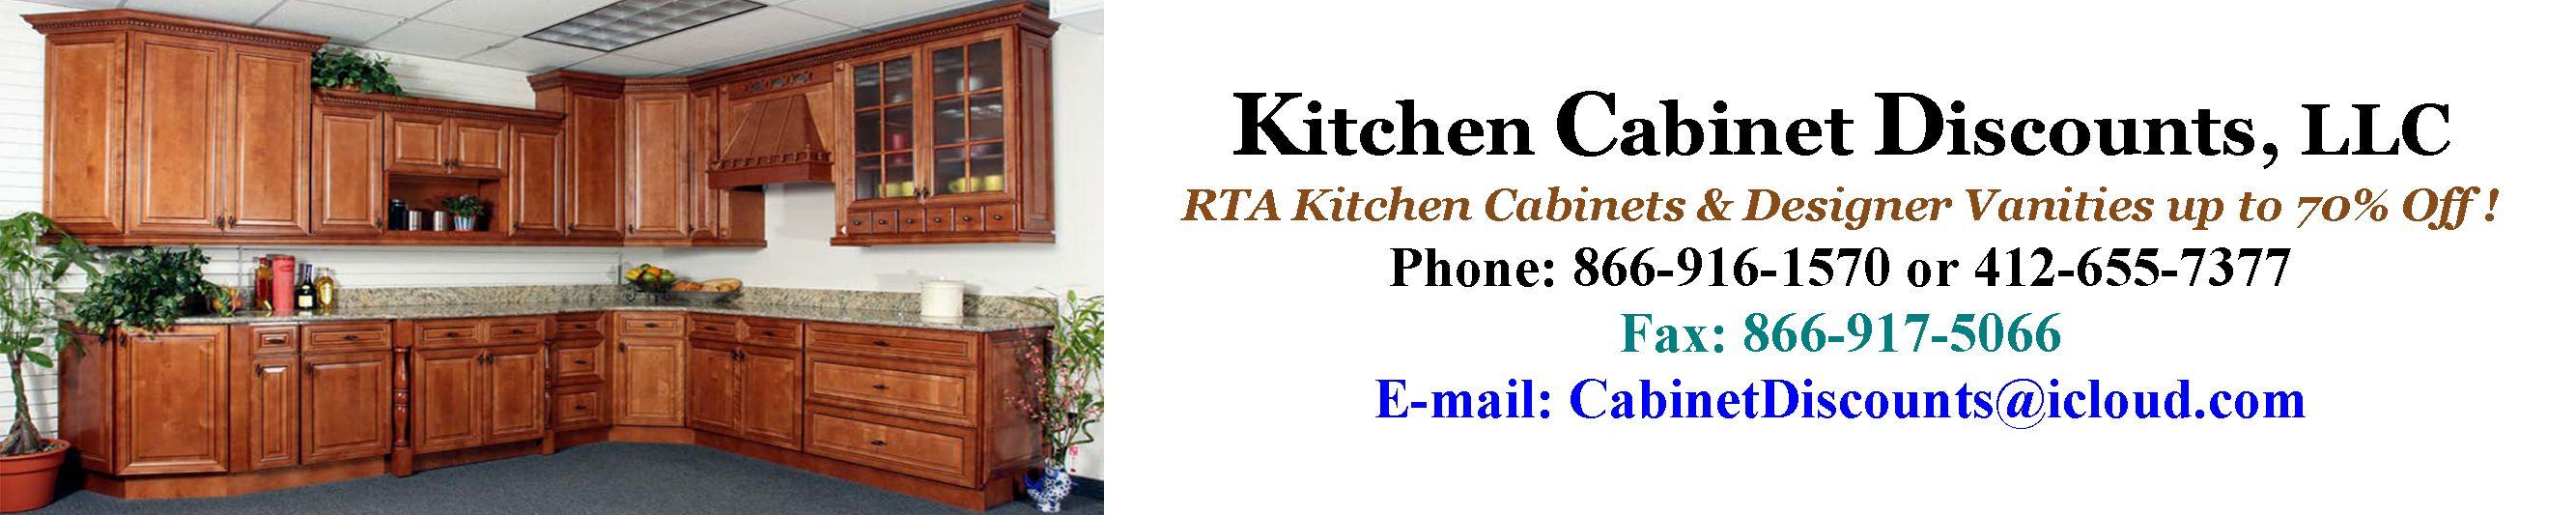 Mail Order Cabinets Rta Kitchen Cabinet Discounts Rta Discount Cabinets Kitchen